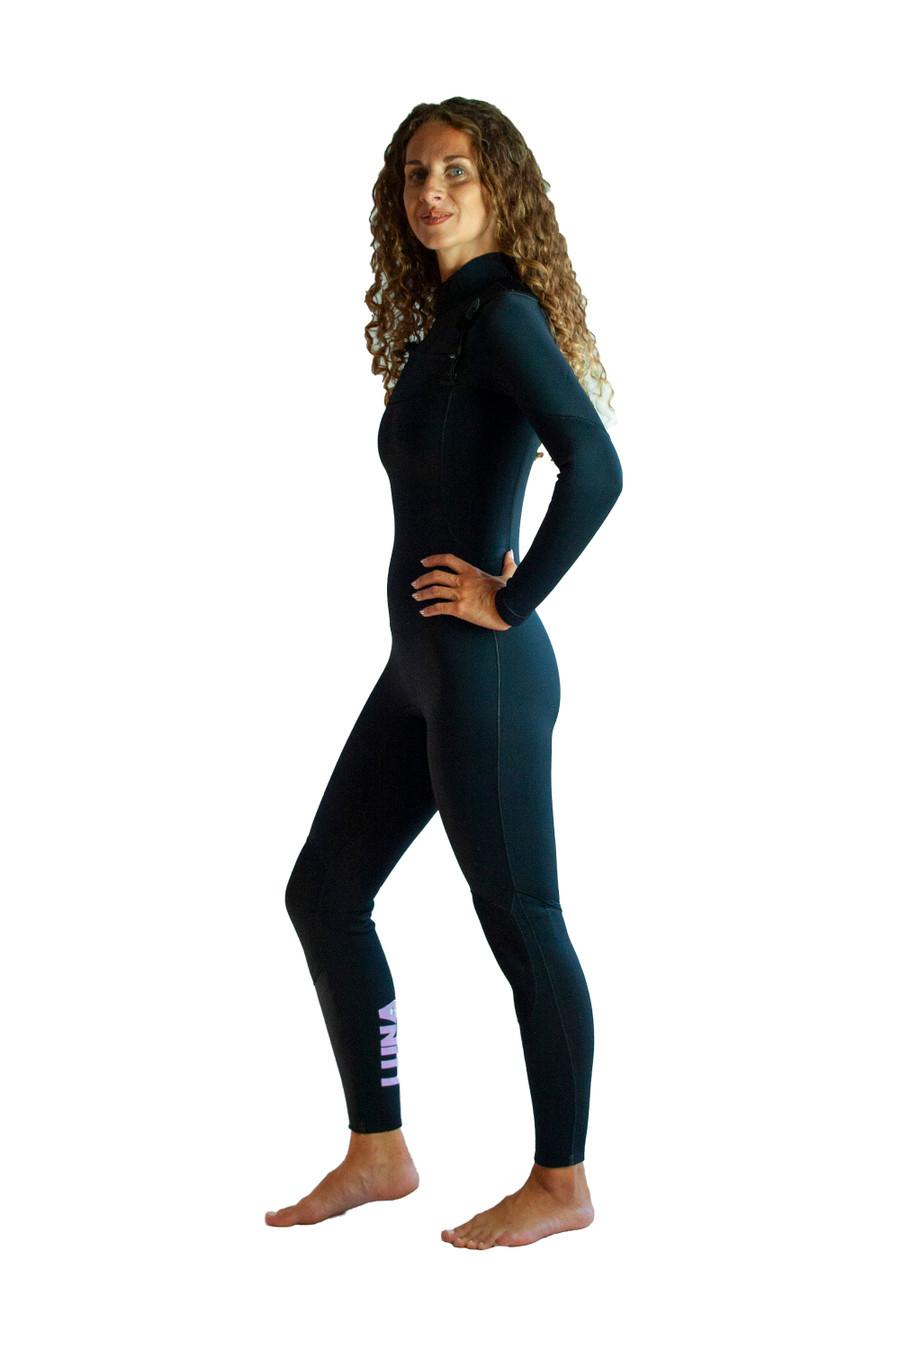 Luna surf Yamamoto women surf wetsuit